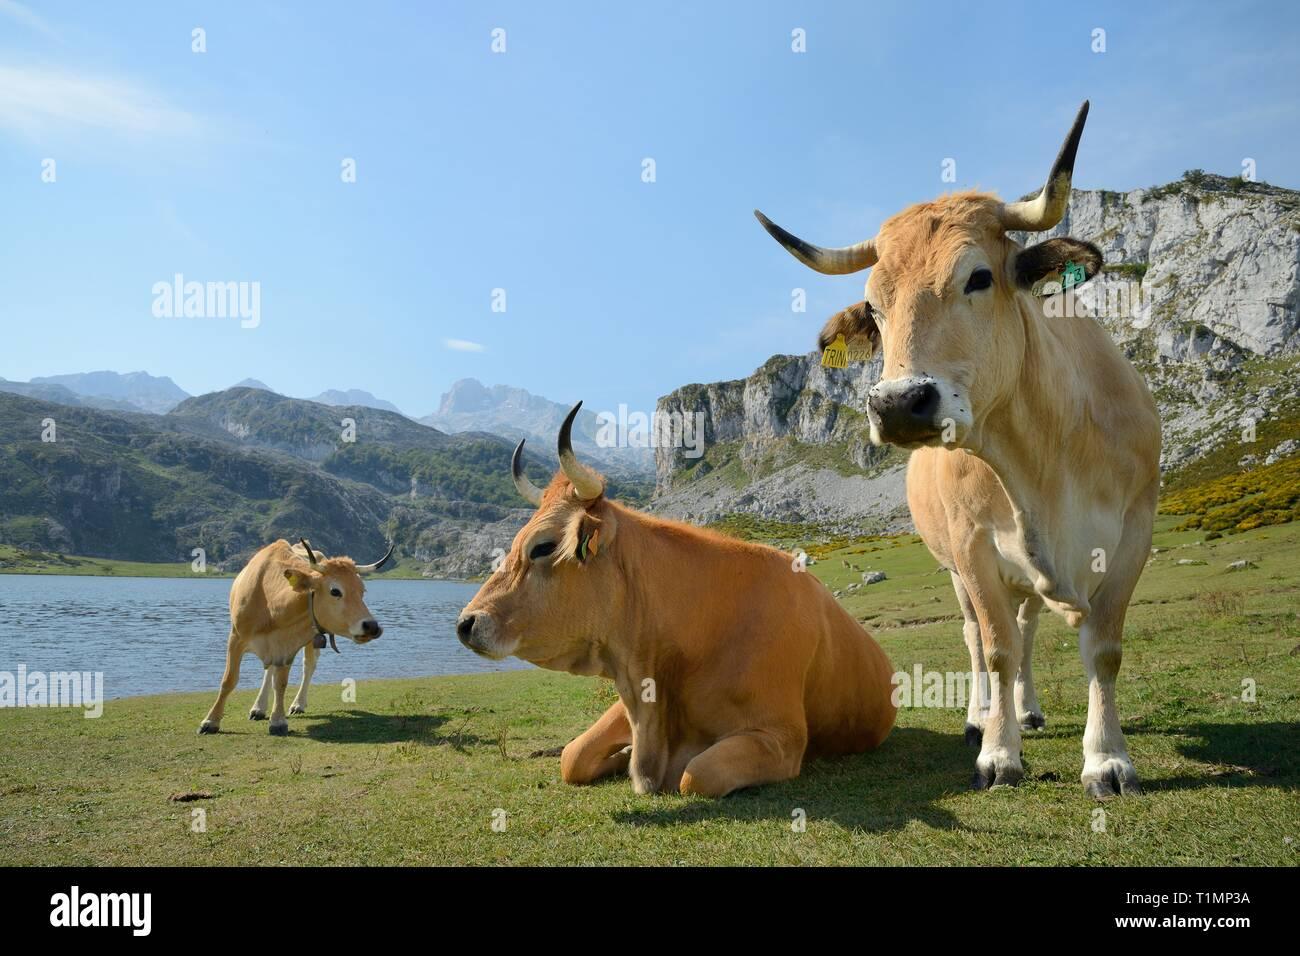 Asturian mountain cattle (Bos taurus) standing on pastureland around Lake Ercina, Lakes of Covadonga, Picos de Europa, Asturias, Spain, August. - Stock Image